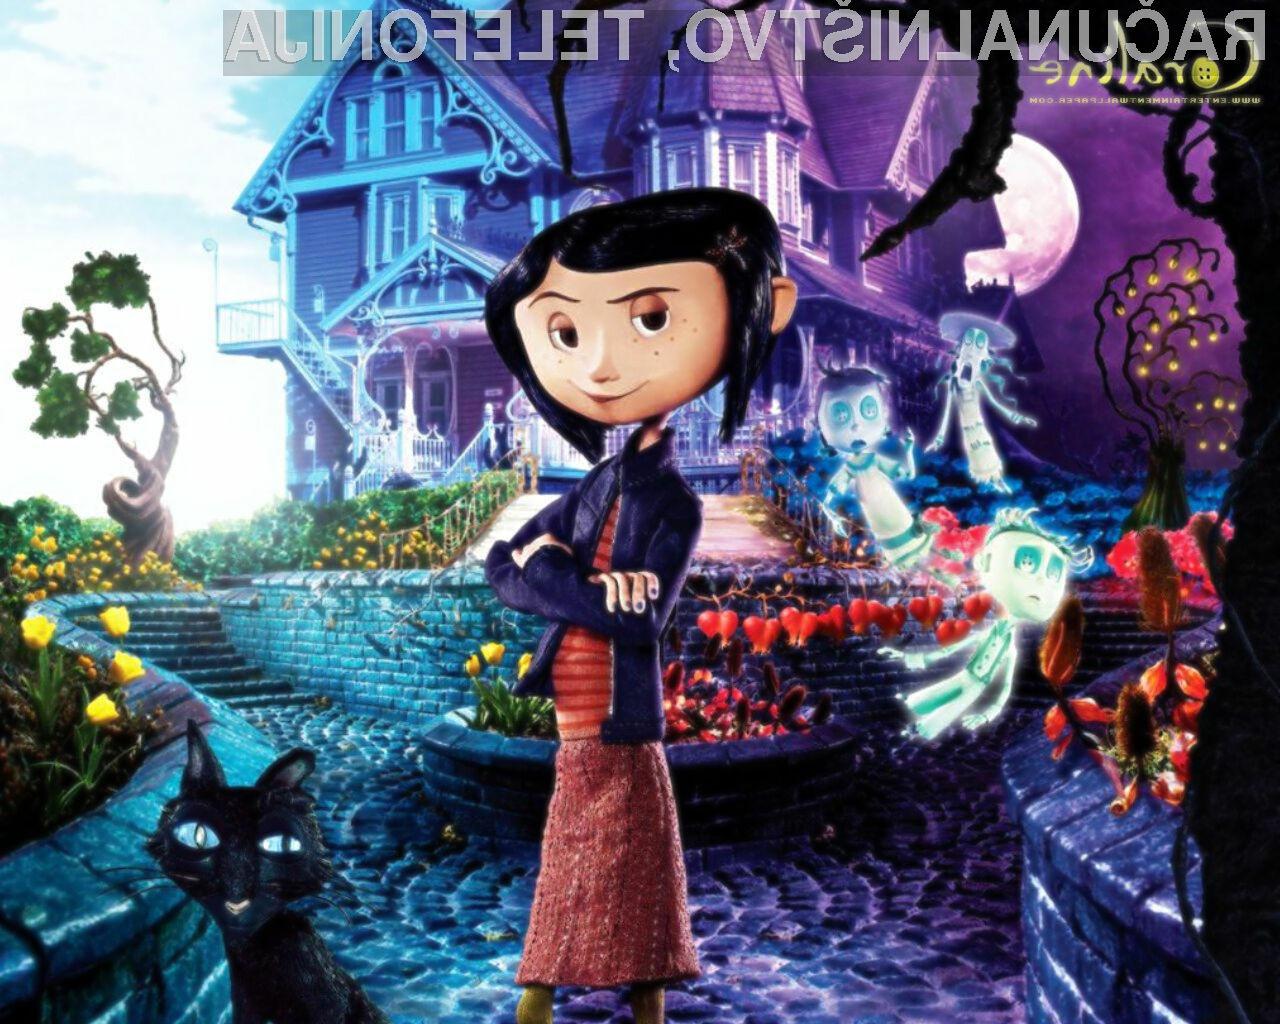 Tridimenzionalna filmska uspešnica Coraline 3D je prva, ki je klonila spretnim filmskim piratom.